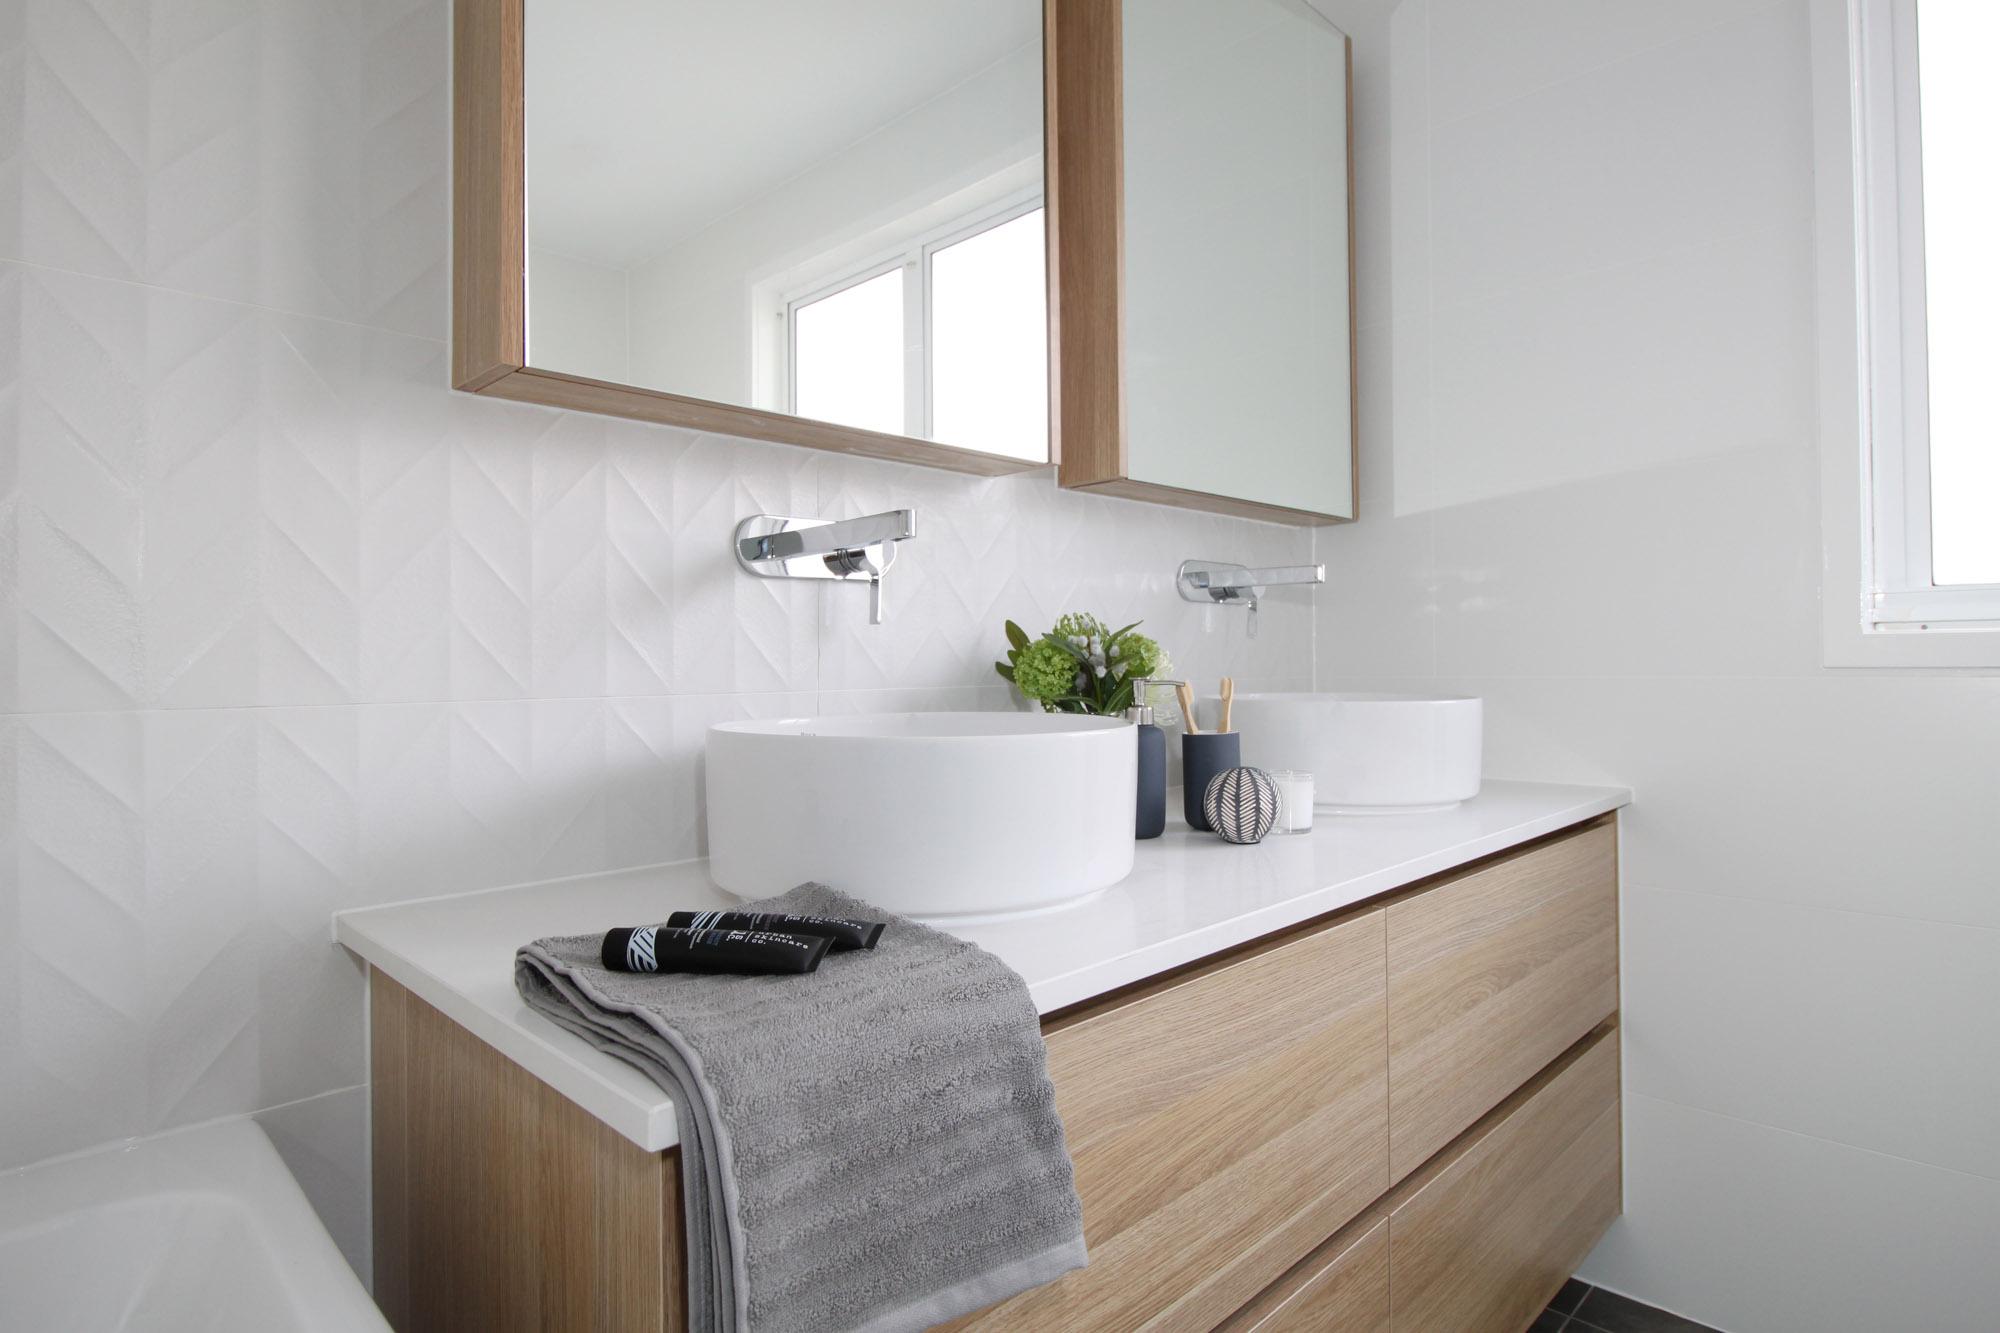 Brisbane Kitchens and Bathrooms - White and Woodgrain vanity